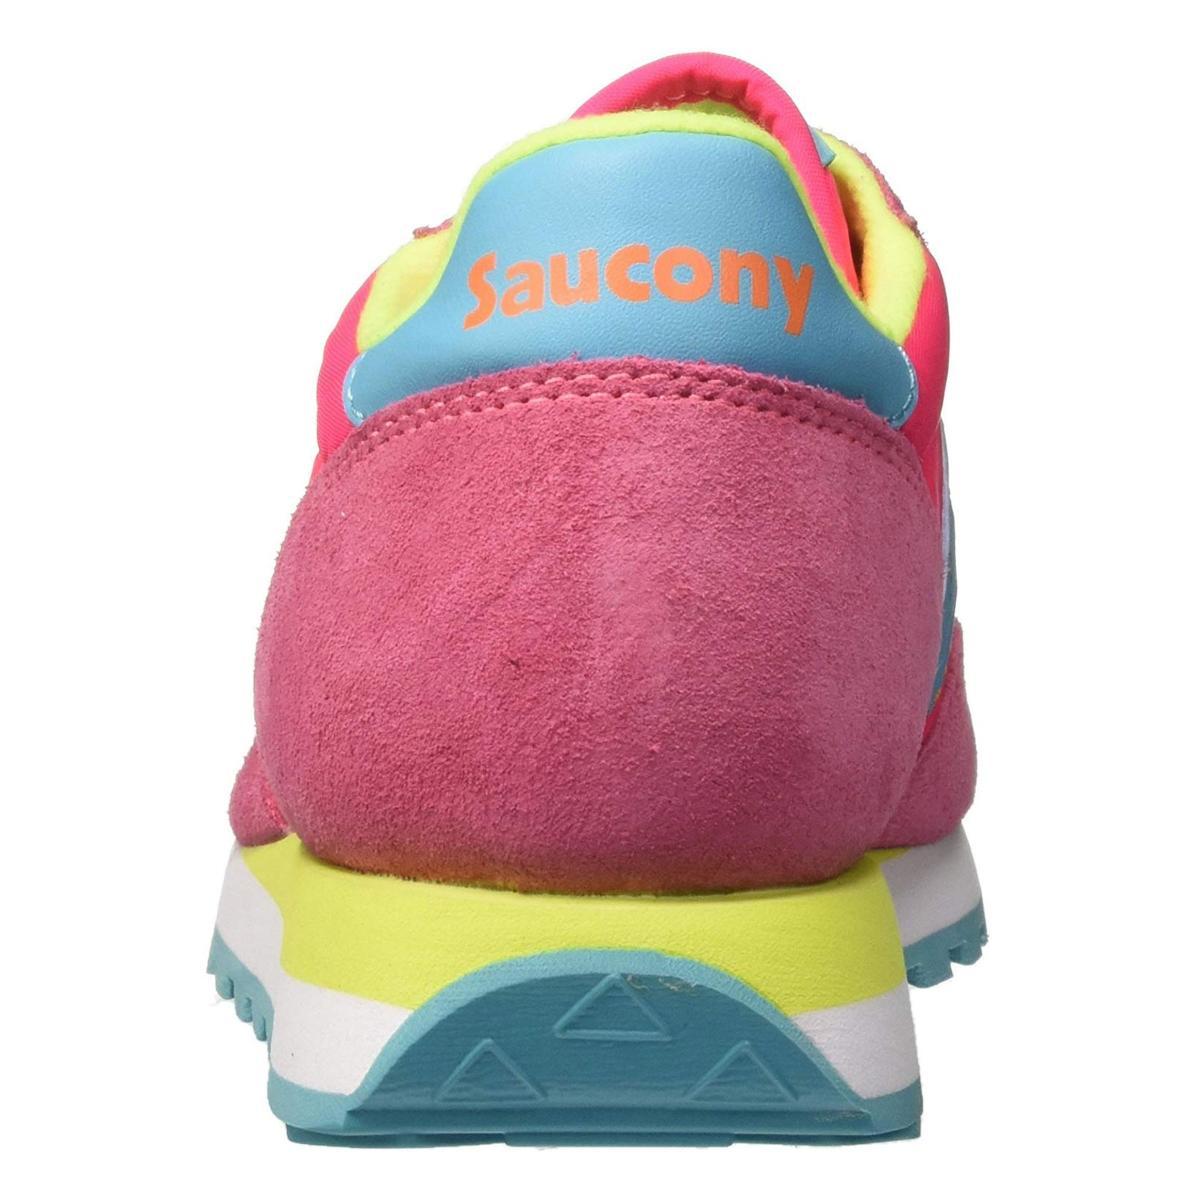 Scarpe Sneakers Saucony Jazz Original Donna rif. 1044-293